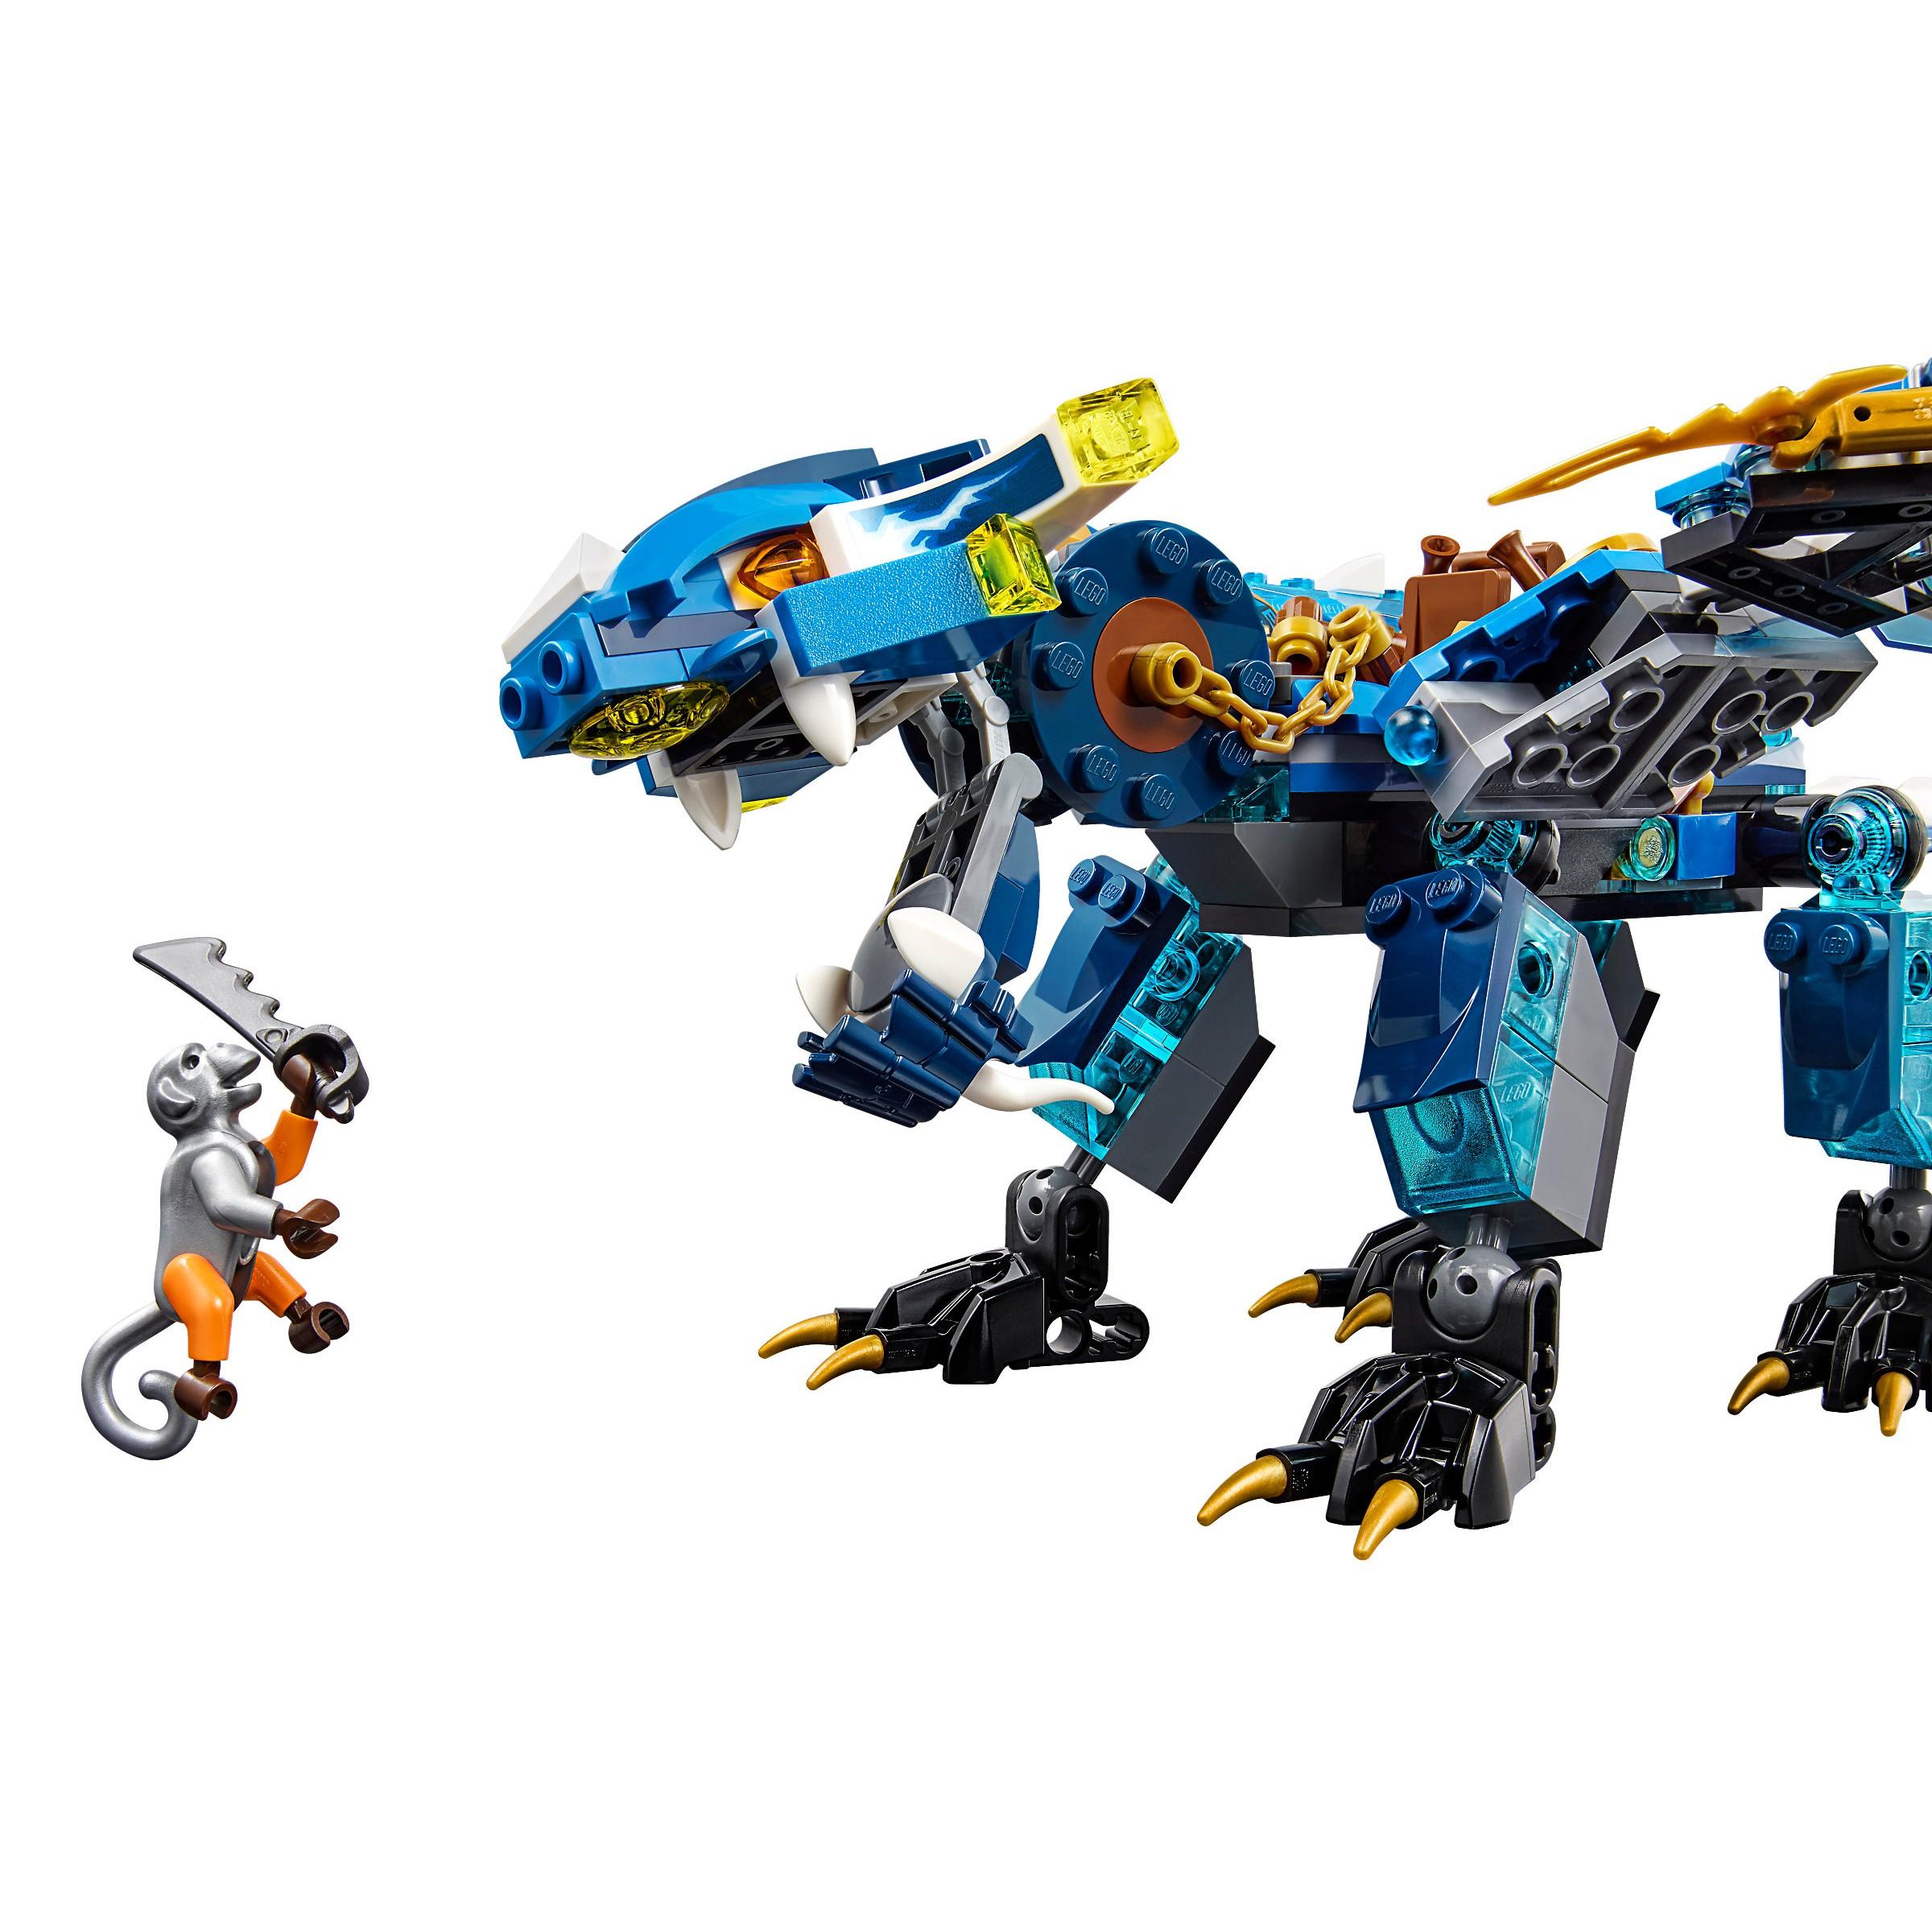 Lego 70602 ninjago jay 39 s elemental dragon at hobby warehouse - Lego ninjago d or ...